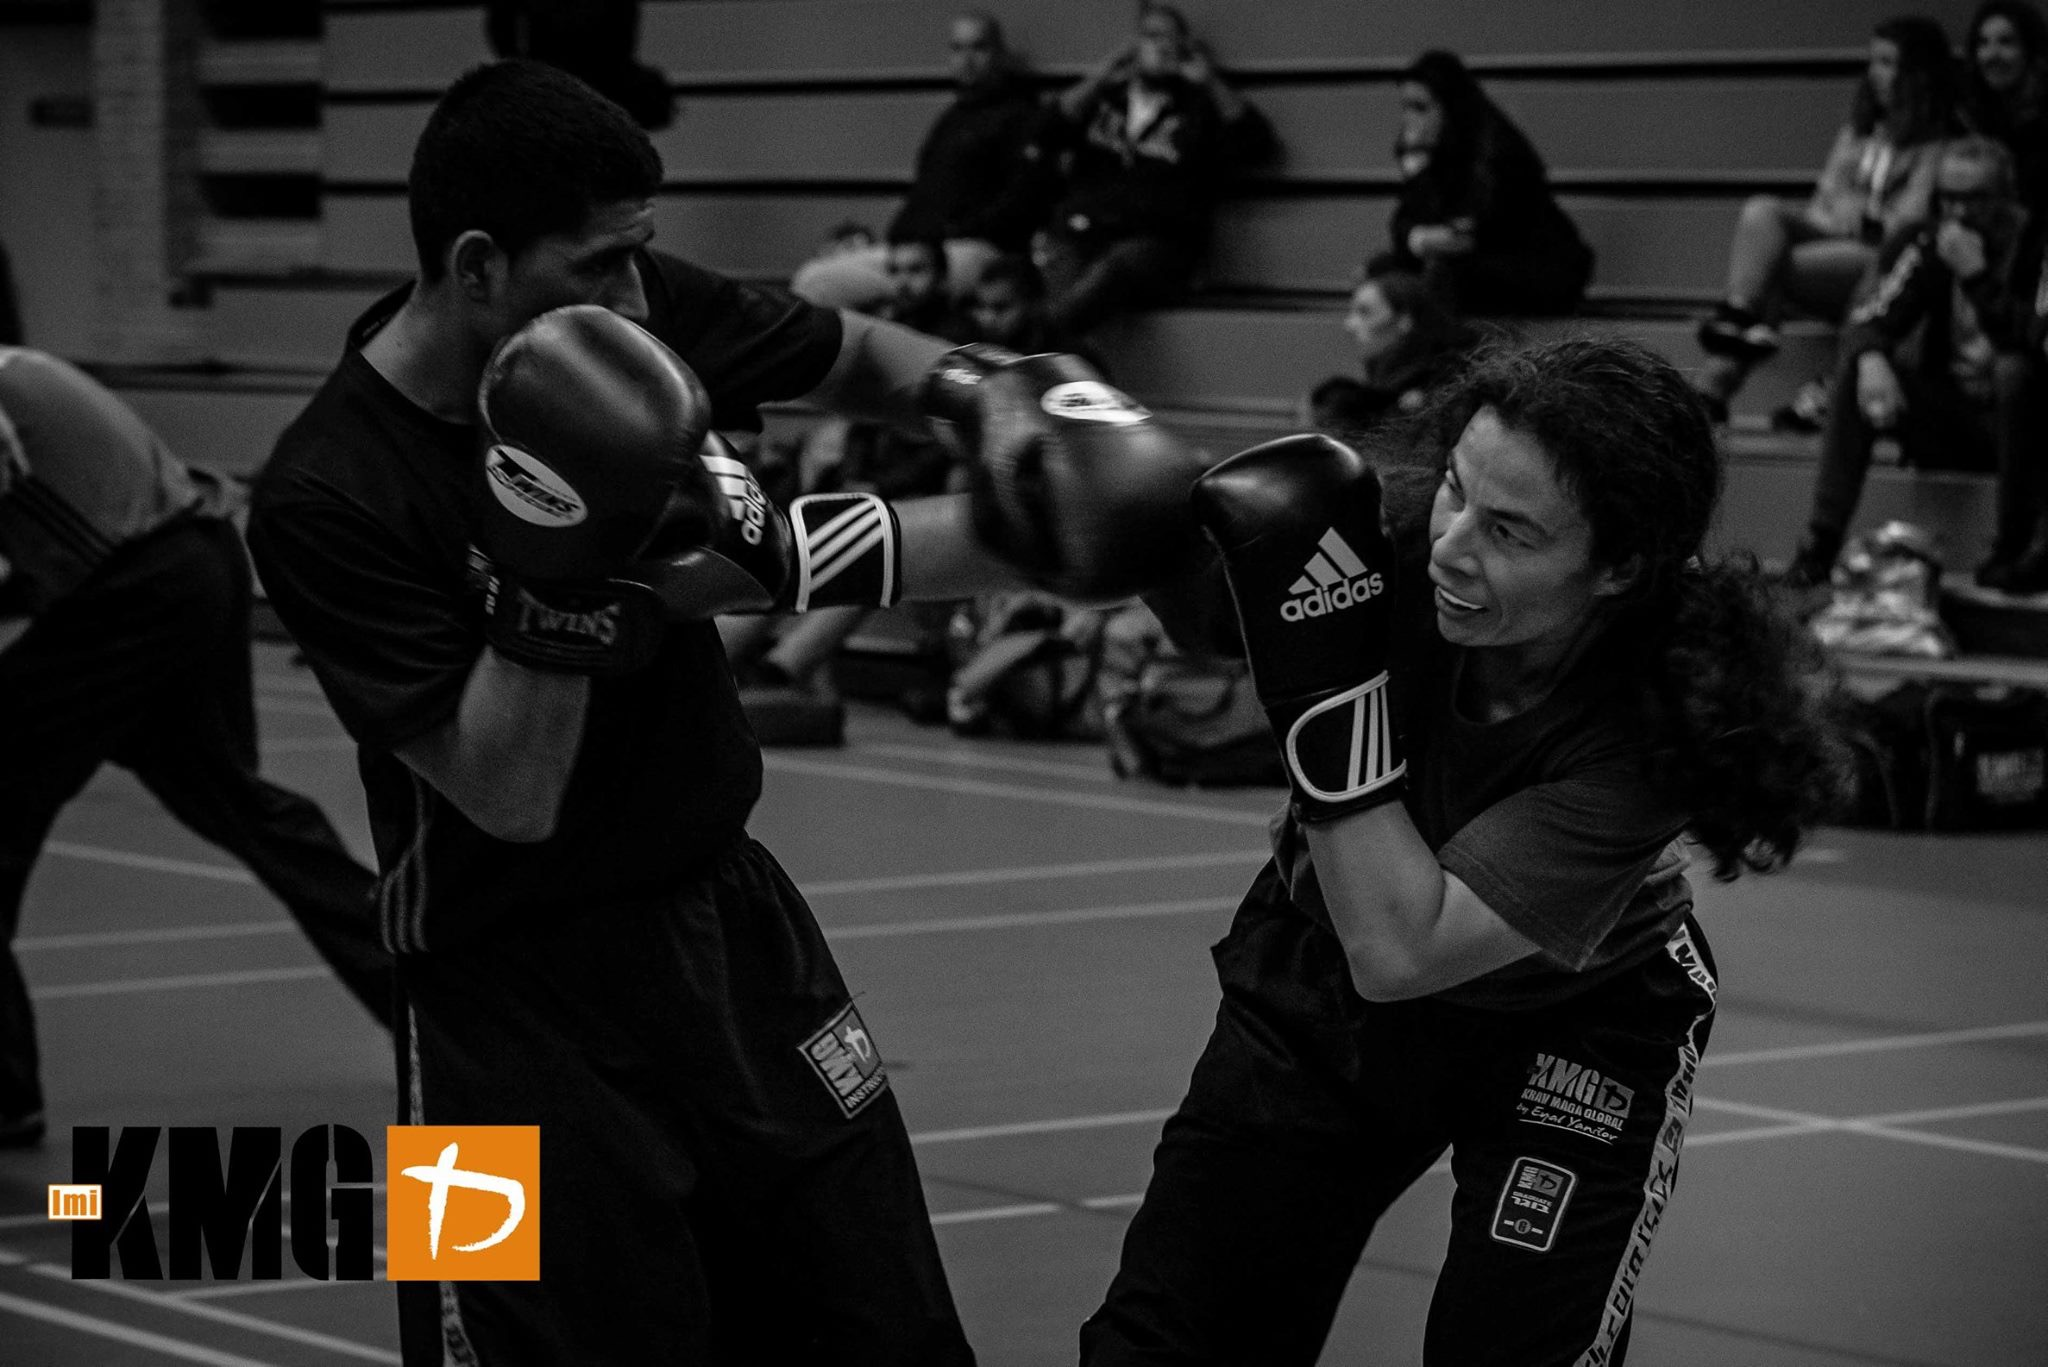 MDH Combat and Training